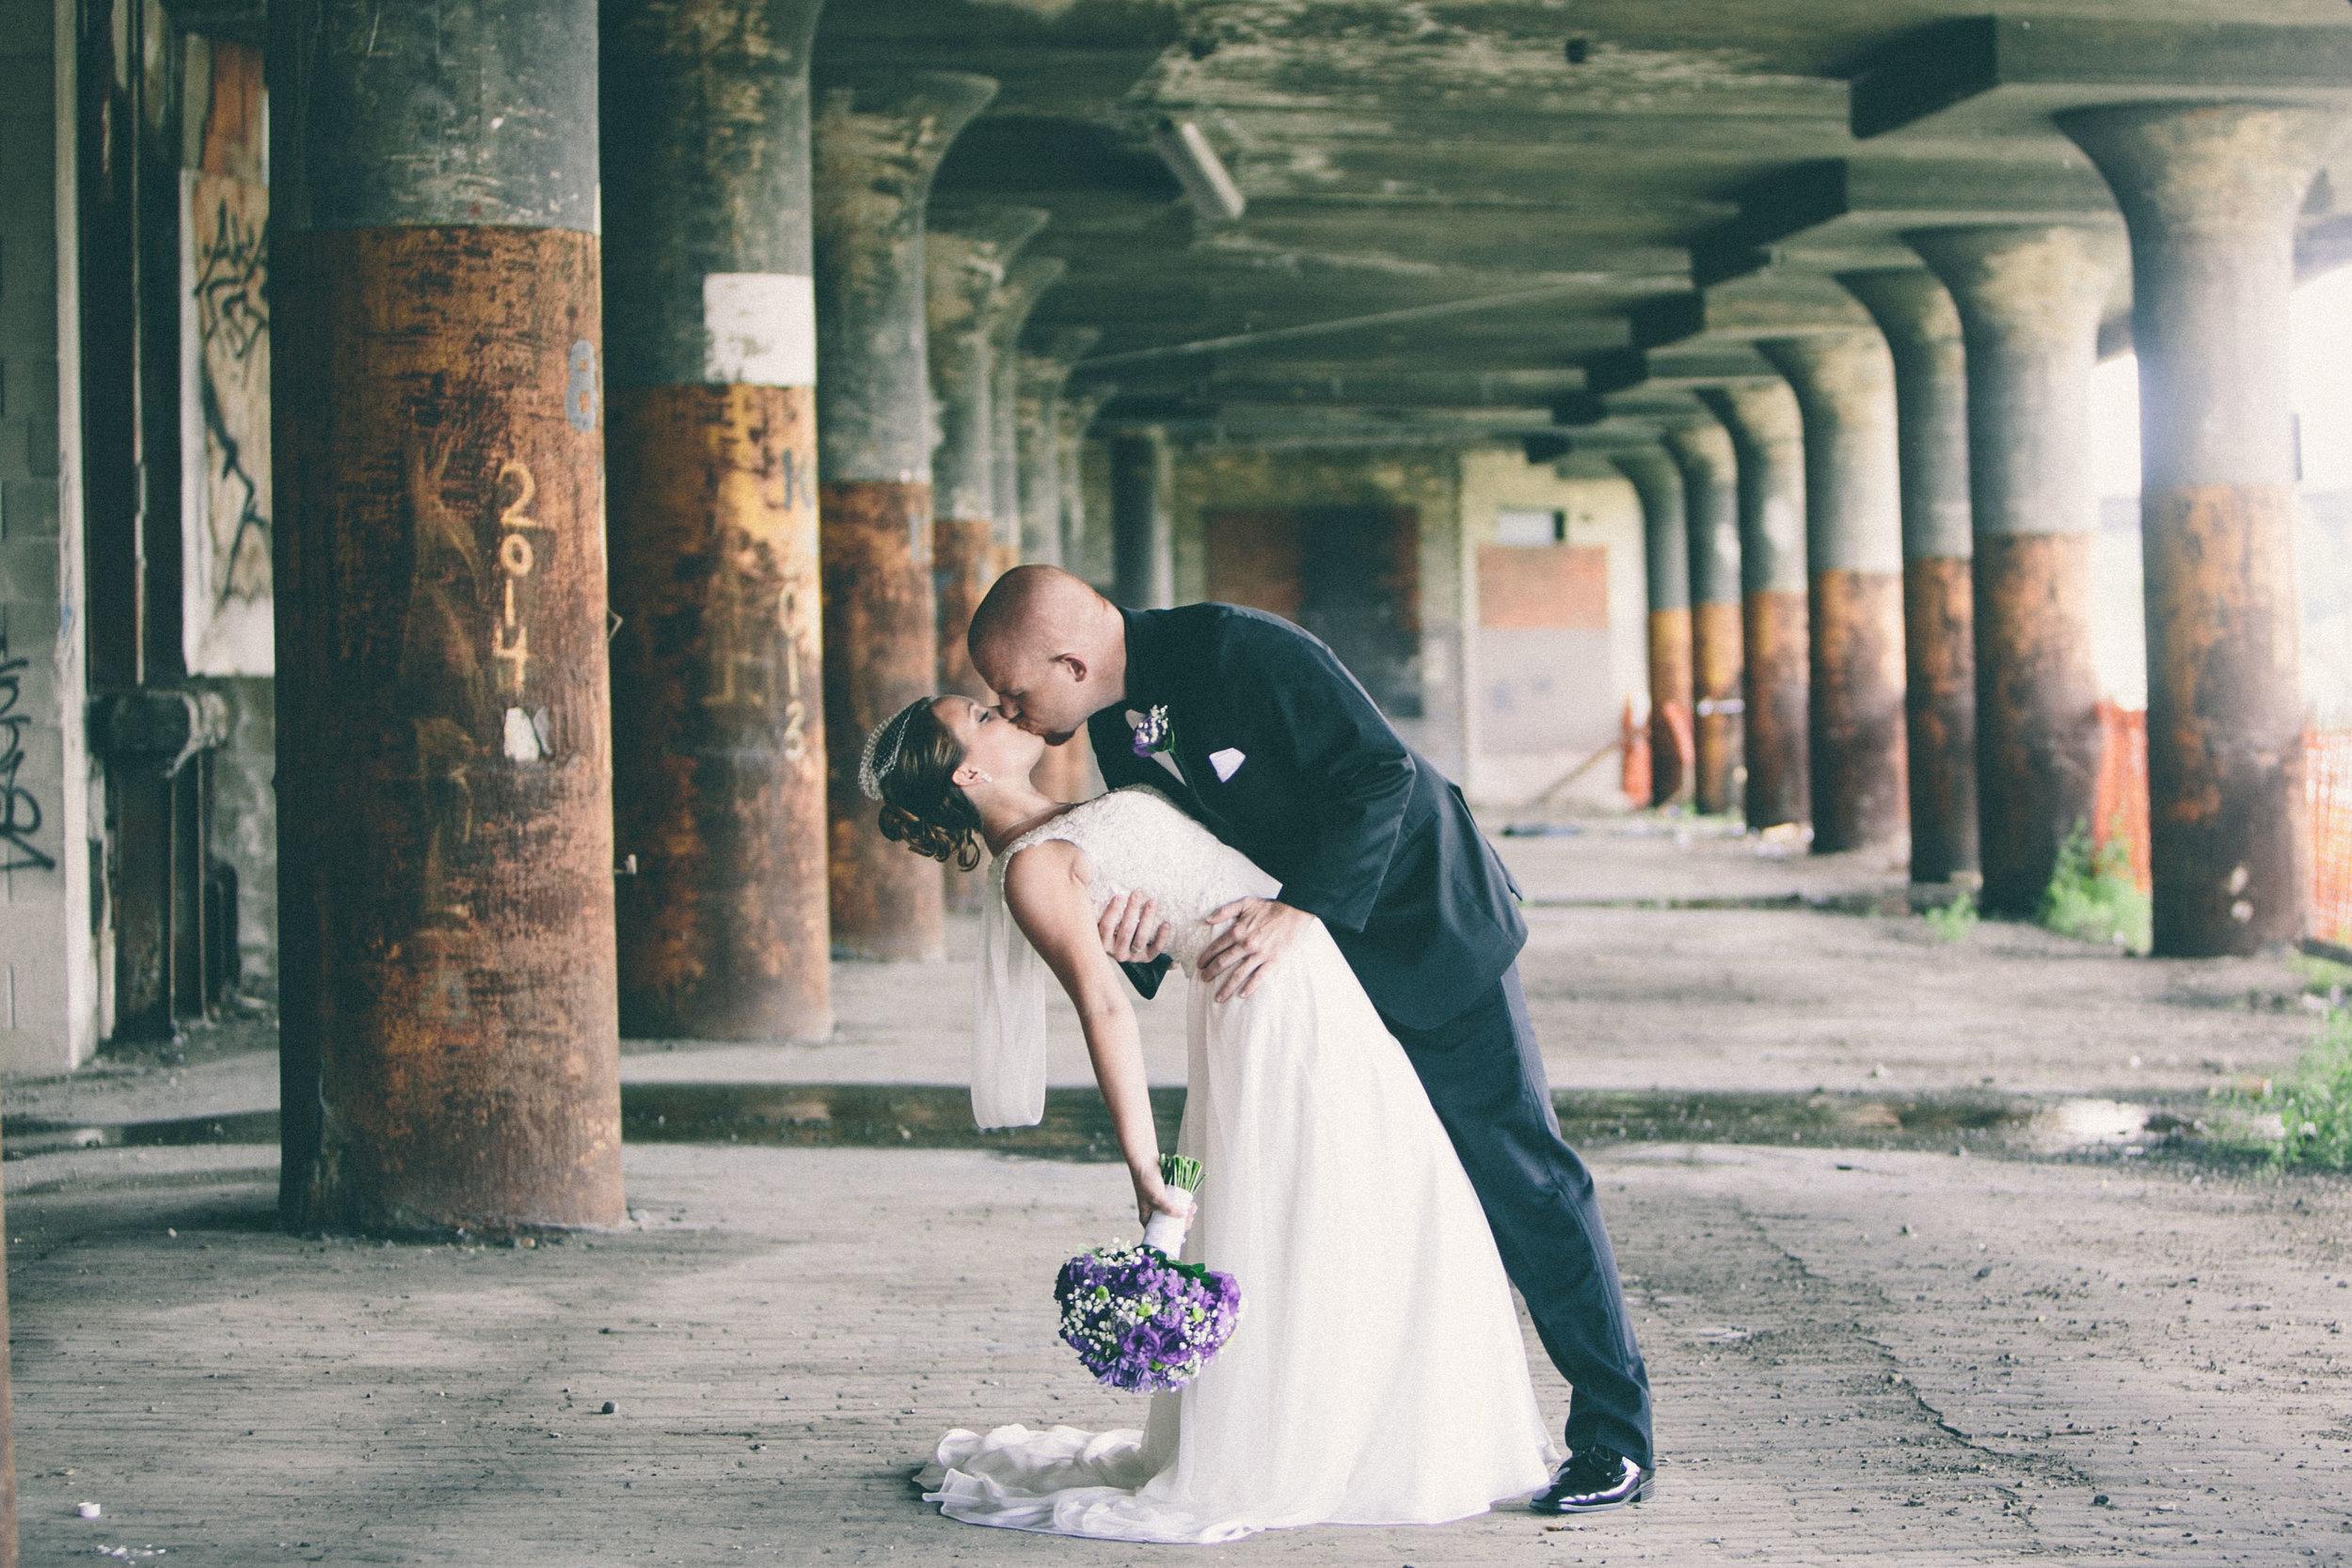 Mark Fierst Minneapolis Wedding Photographer | Sixpence Standard blog post | industrial backdrop